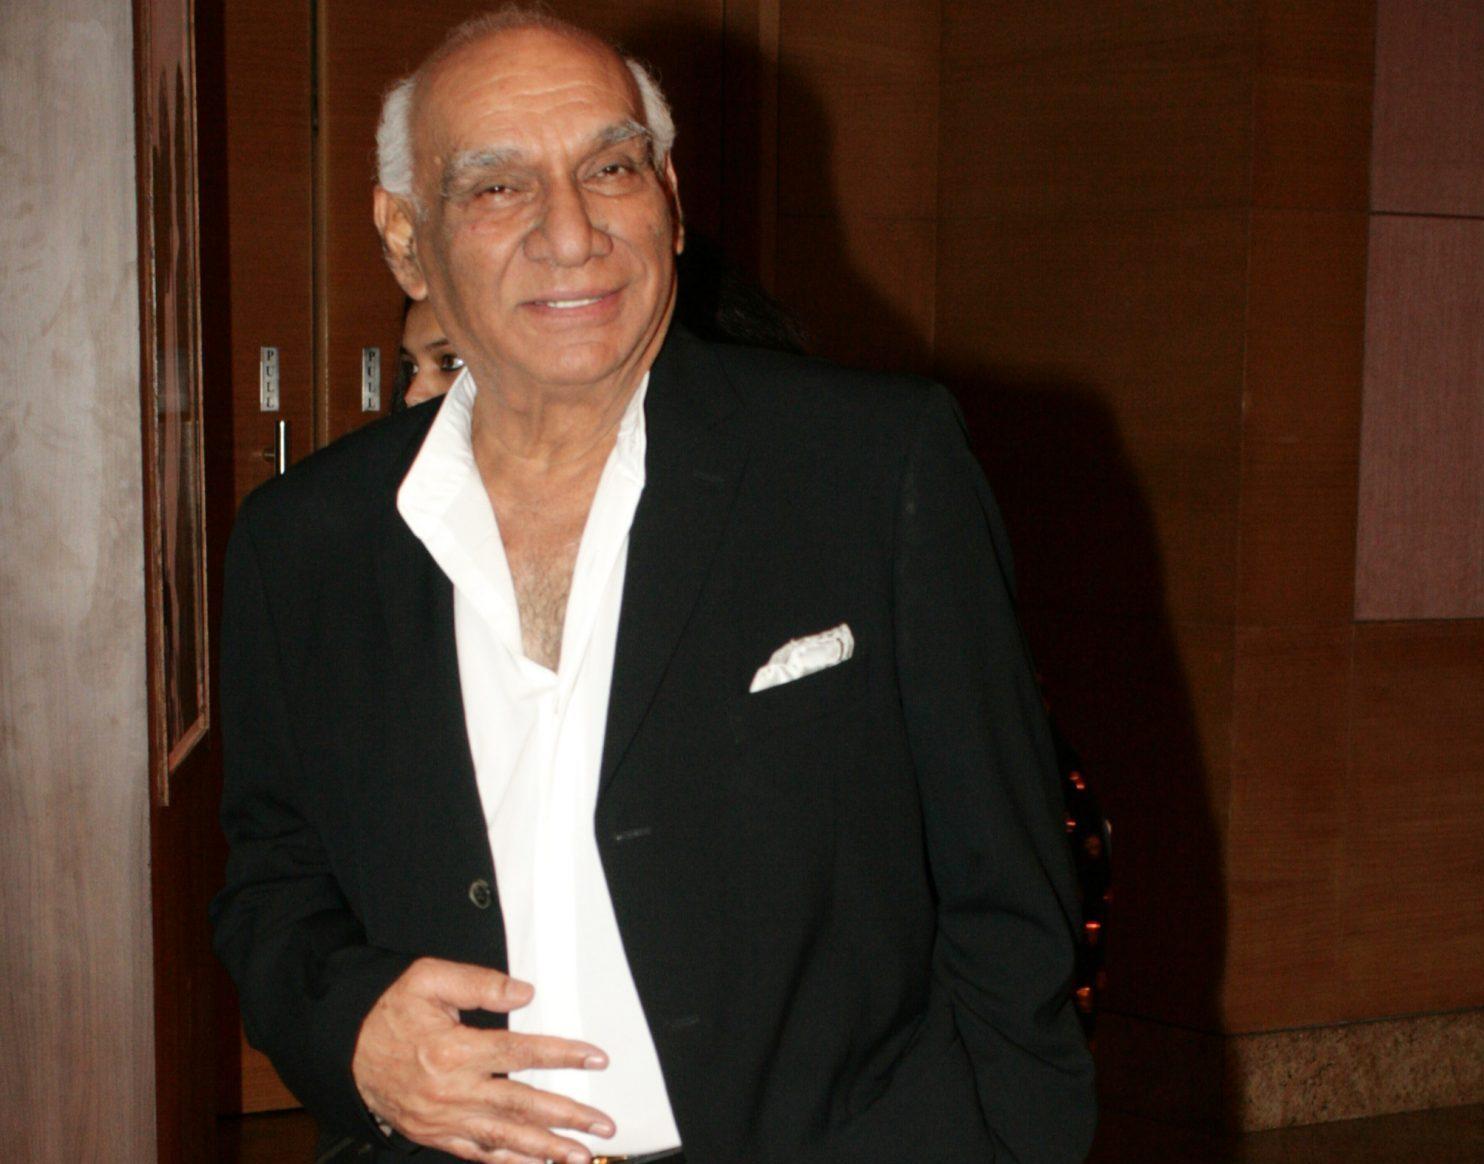 Yash Chopra (Photo by Getty Images)